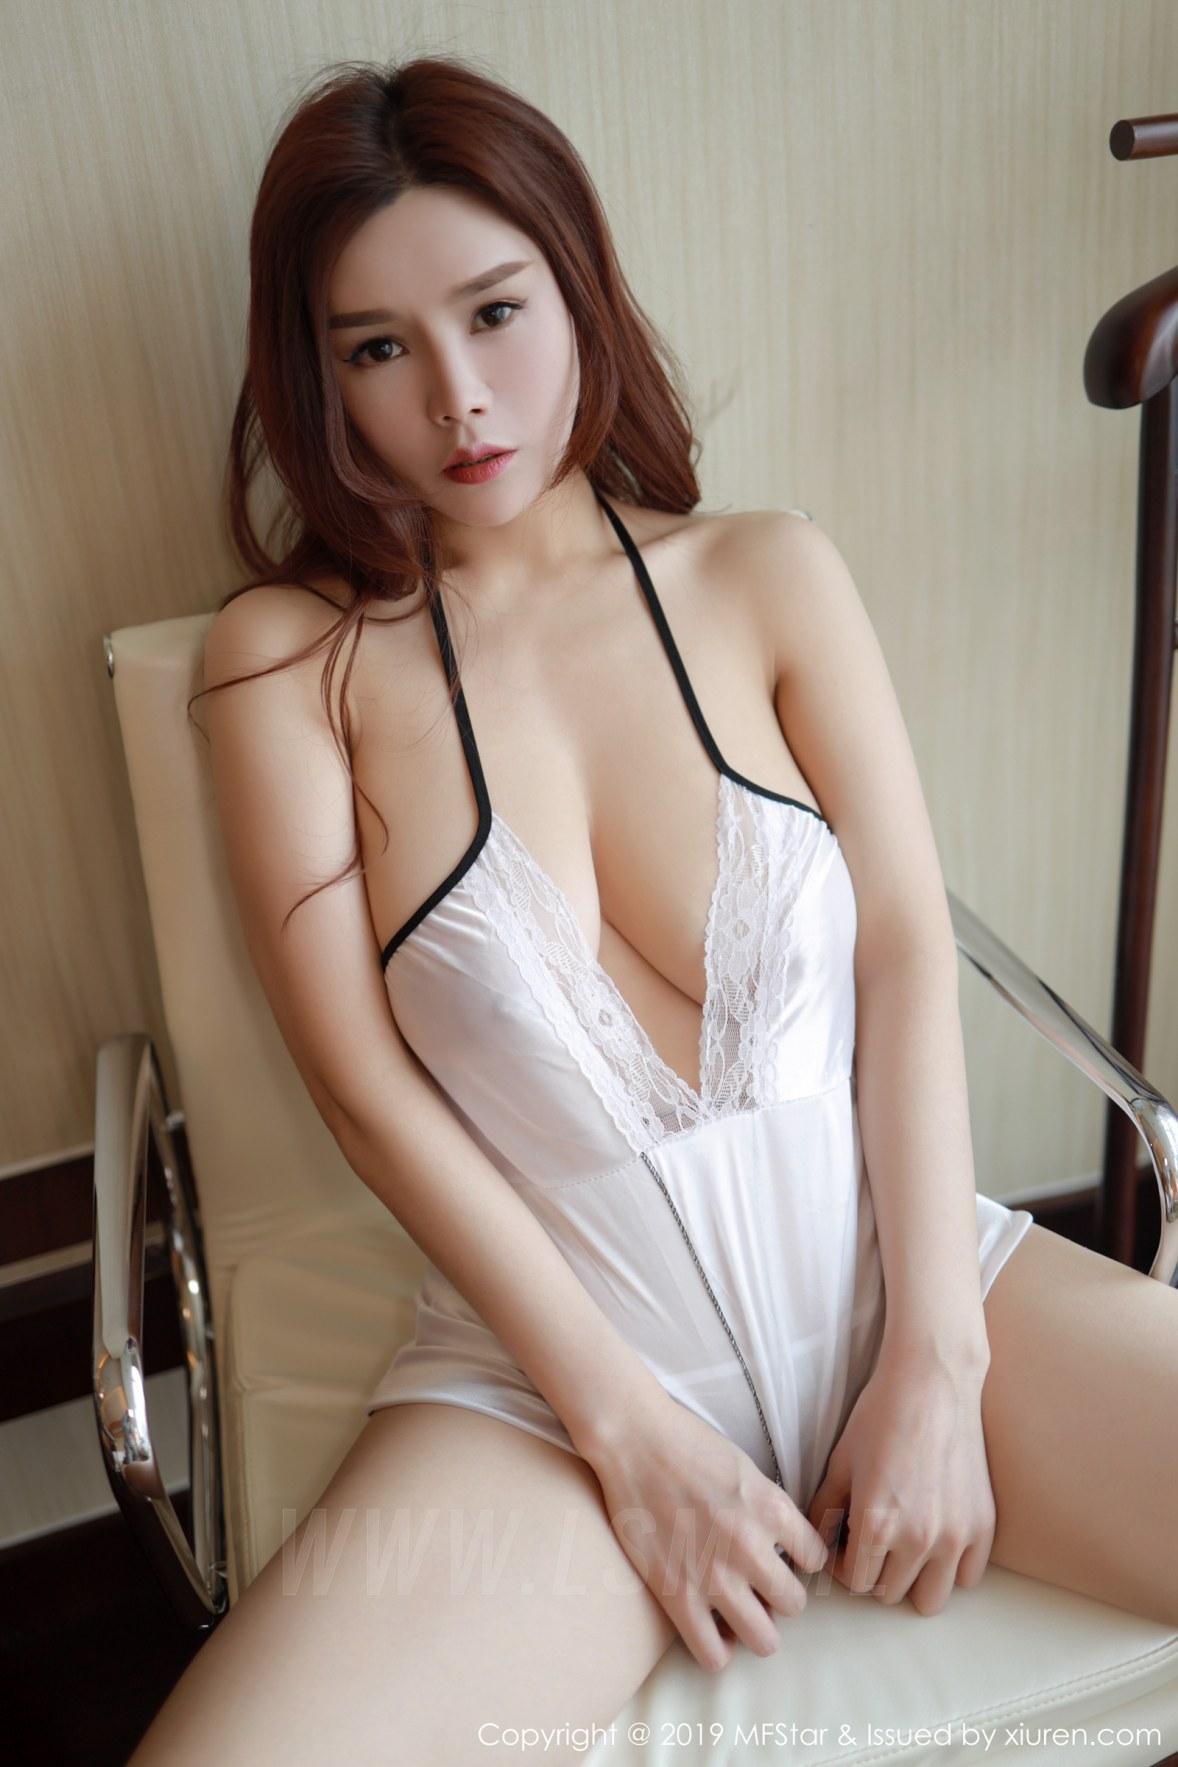 MFStar 模范学院 Vol.185 胡润曦201712  身材丰腴 - 1